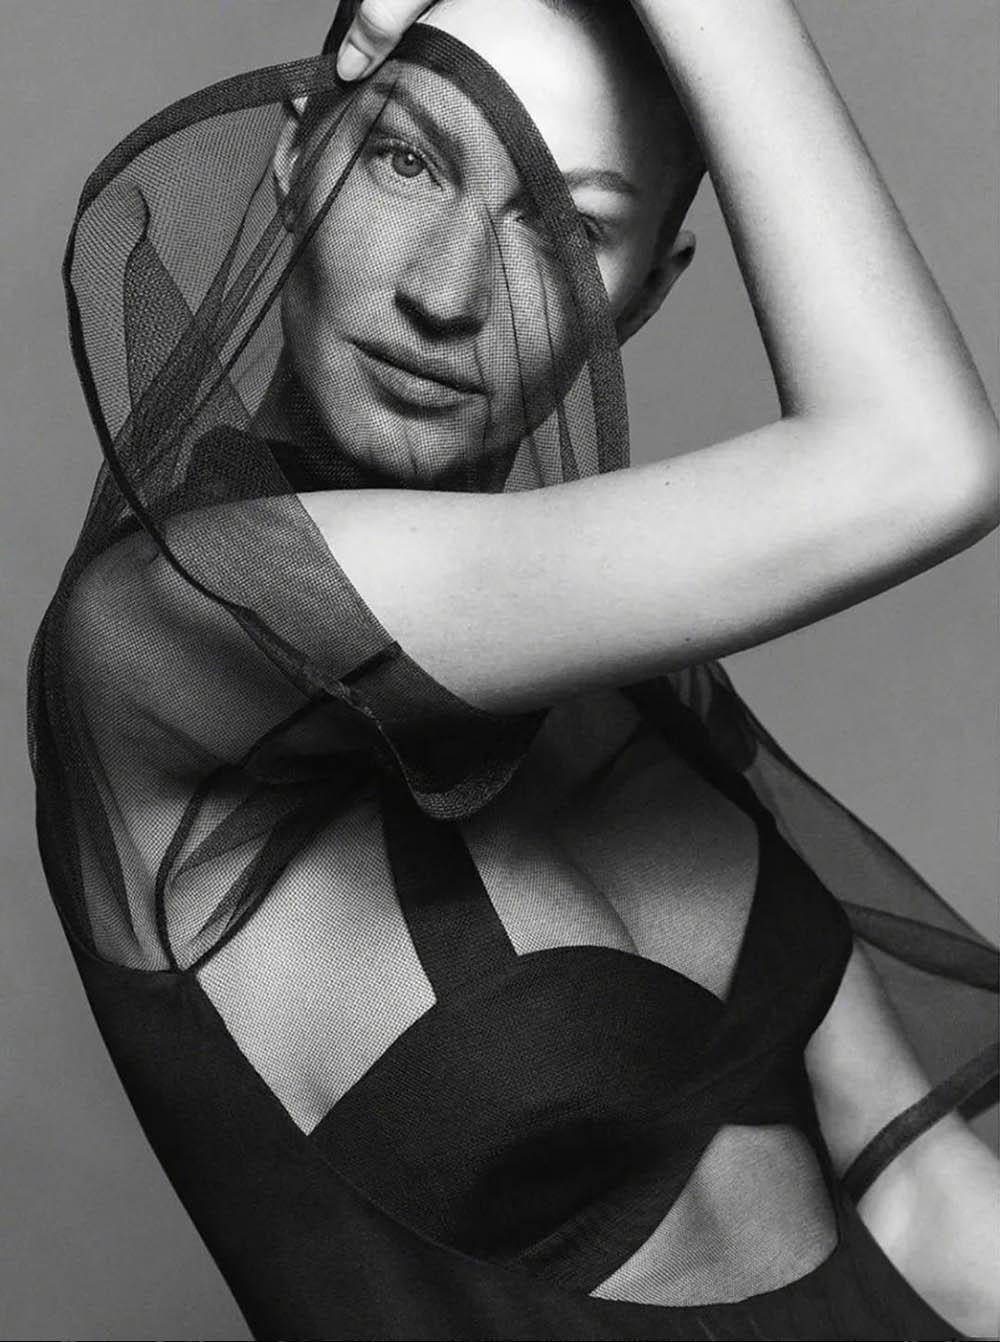 Gisele Bündchen covers Vogue Brazil May 2020 by Luigi & Iango